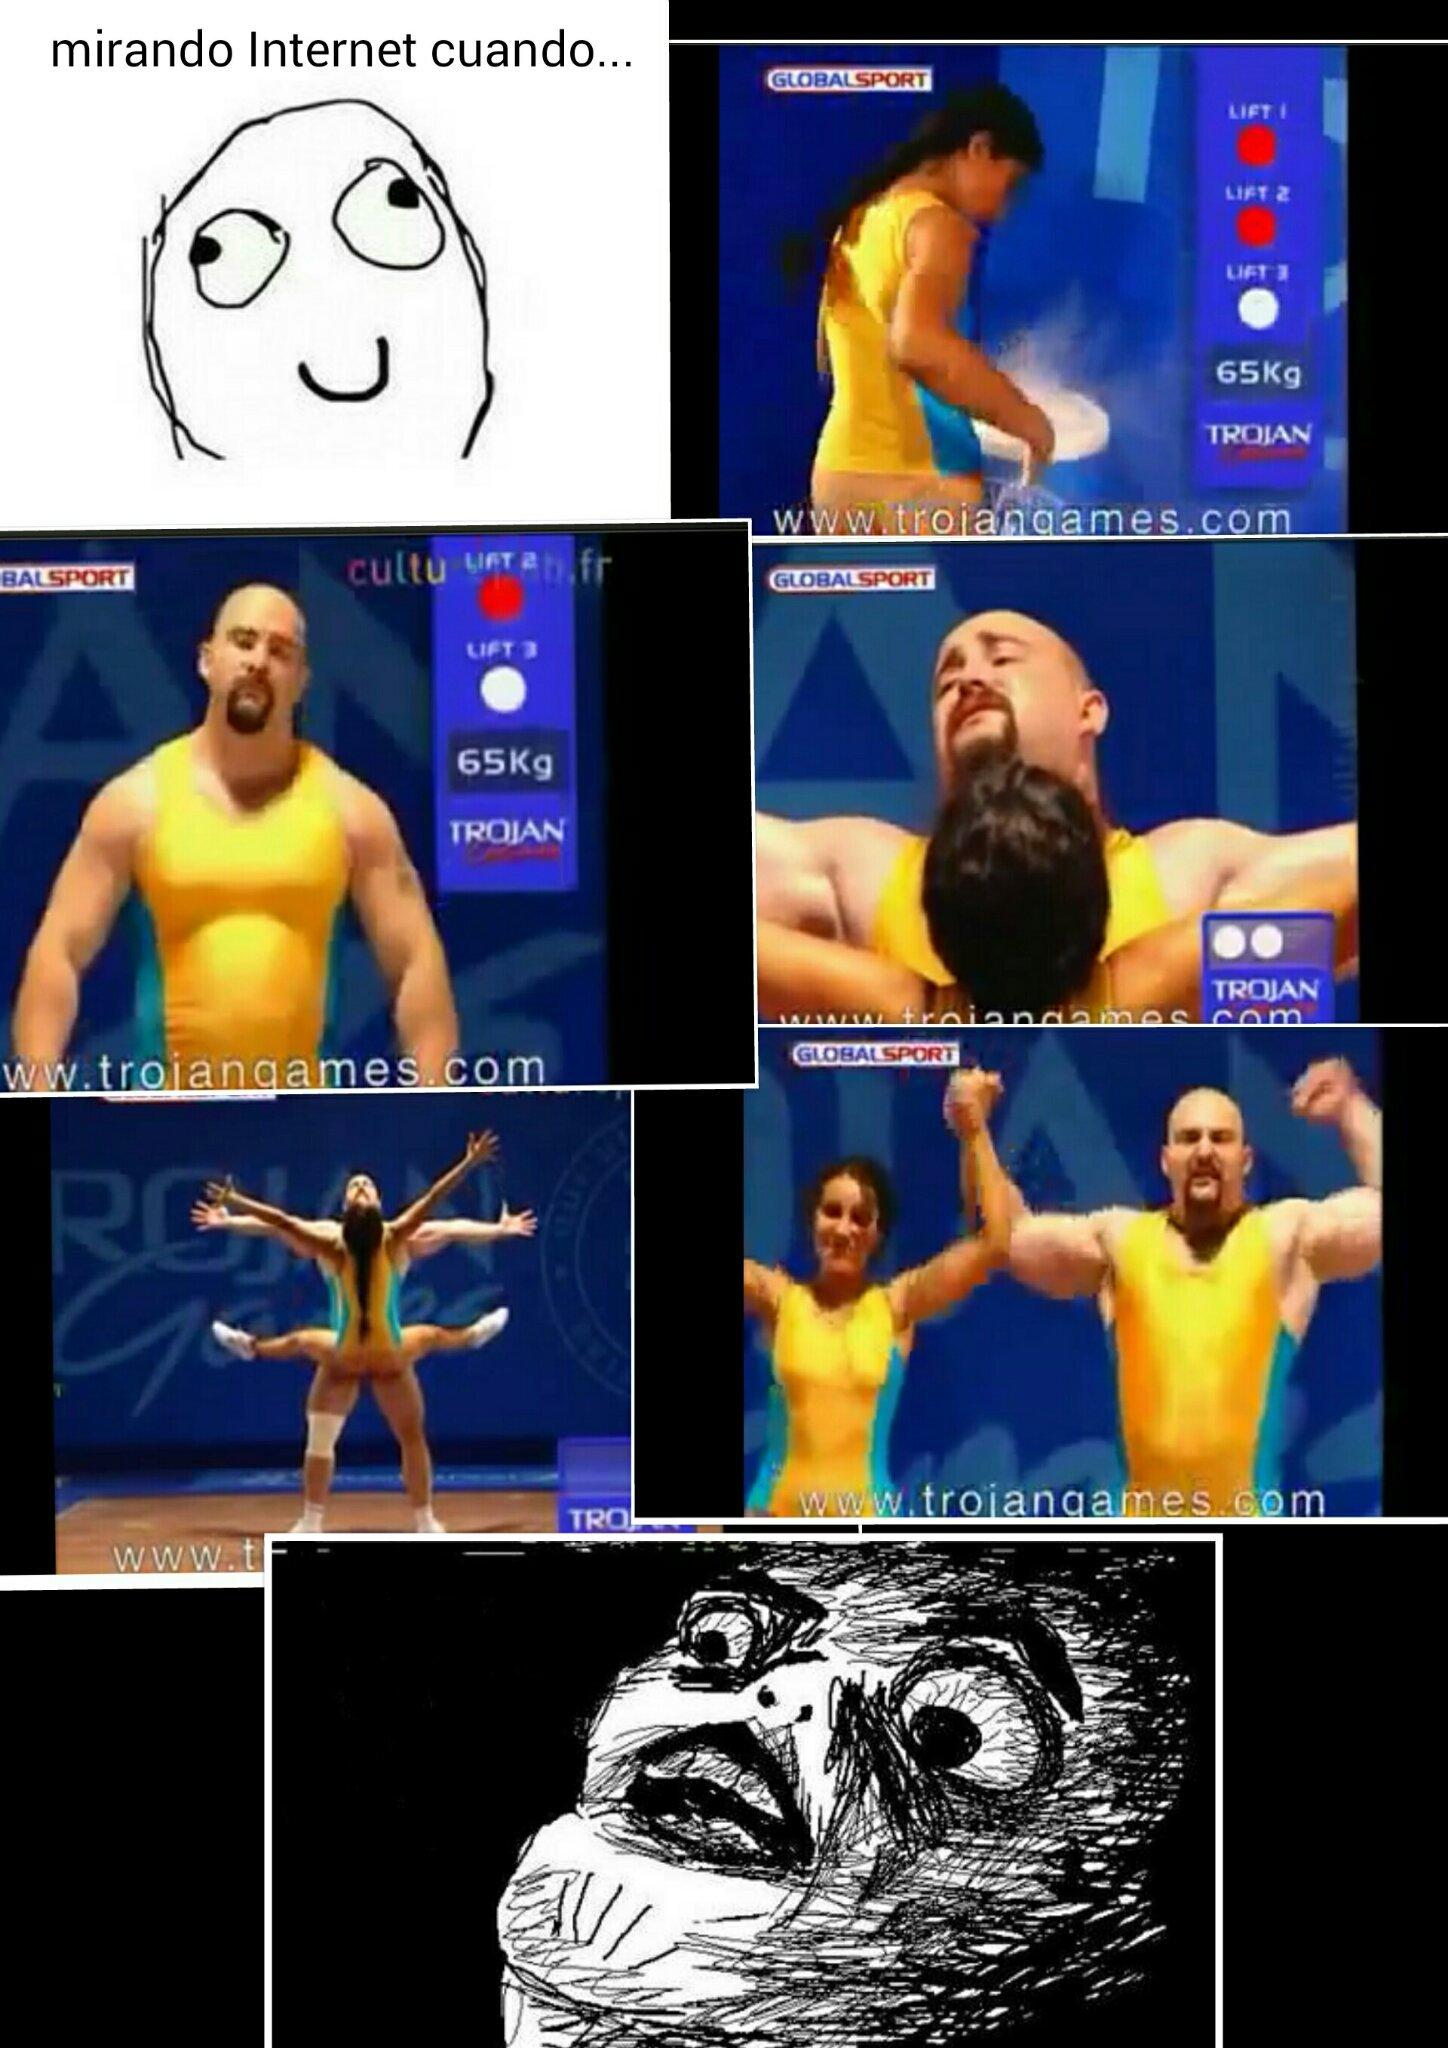 olimpico - meme